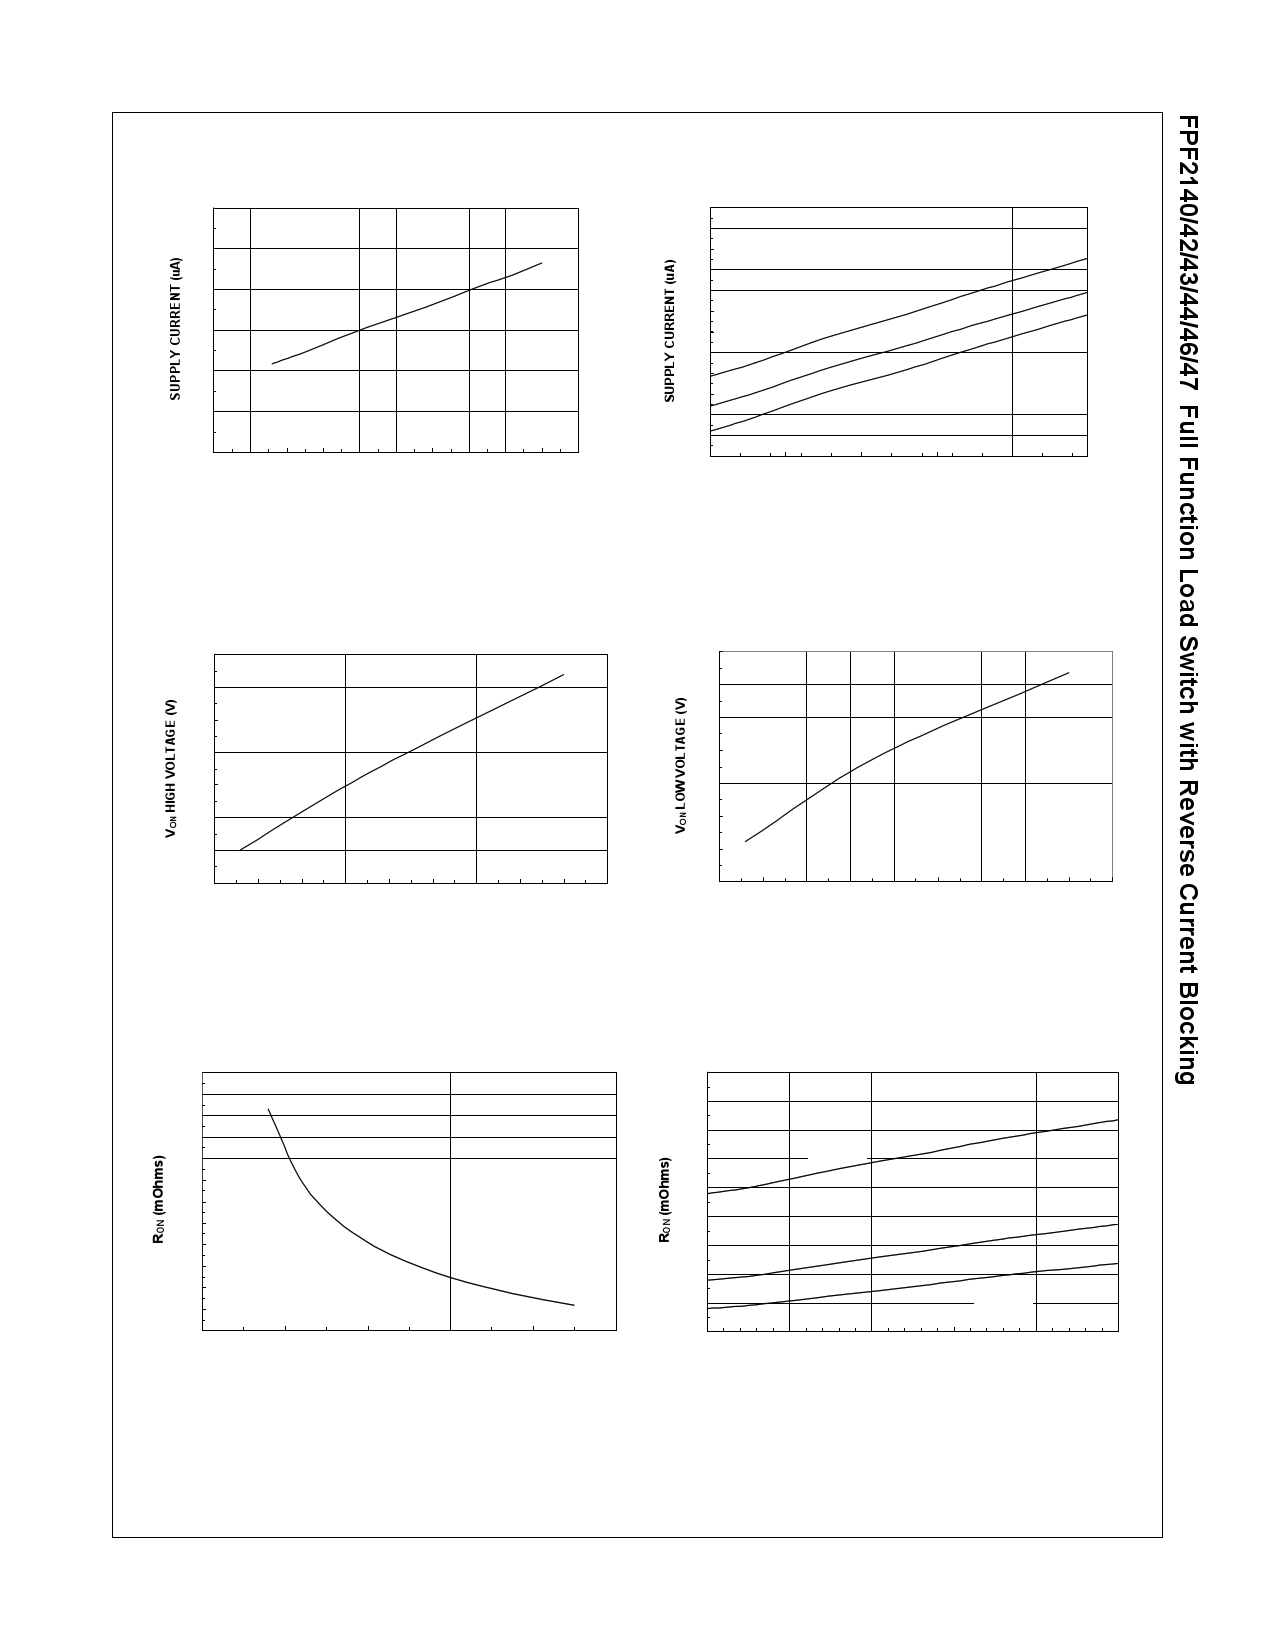 FPF2140 pdf, arduino